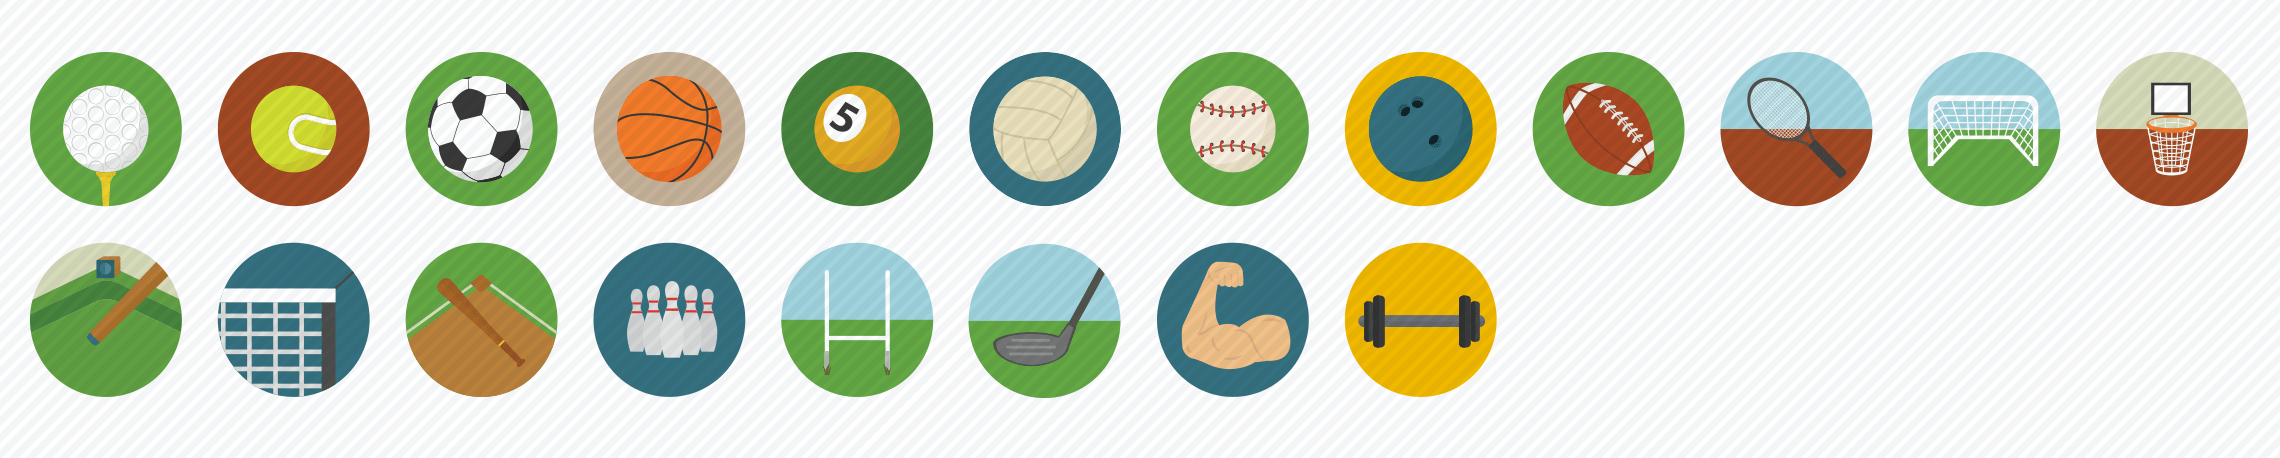 sports-flat-icons-set